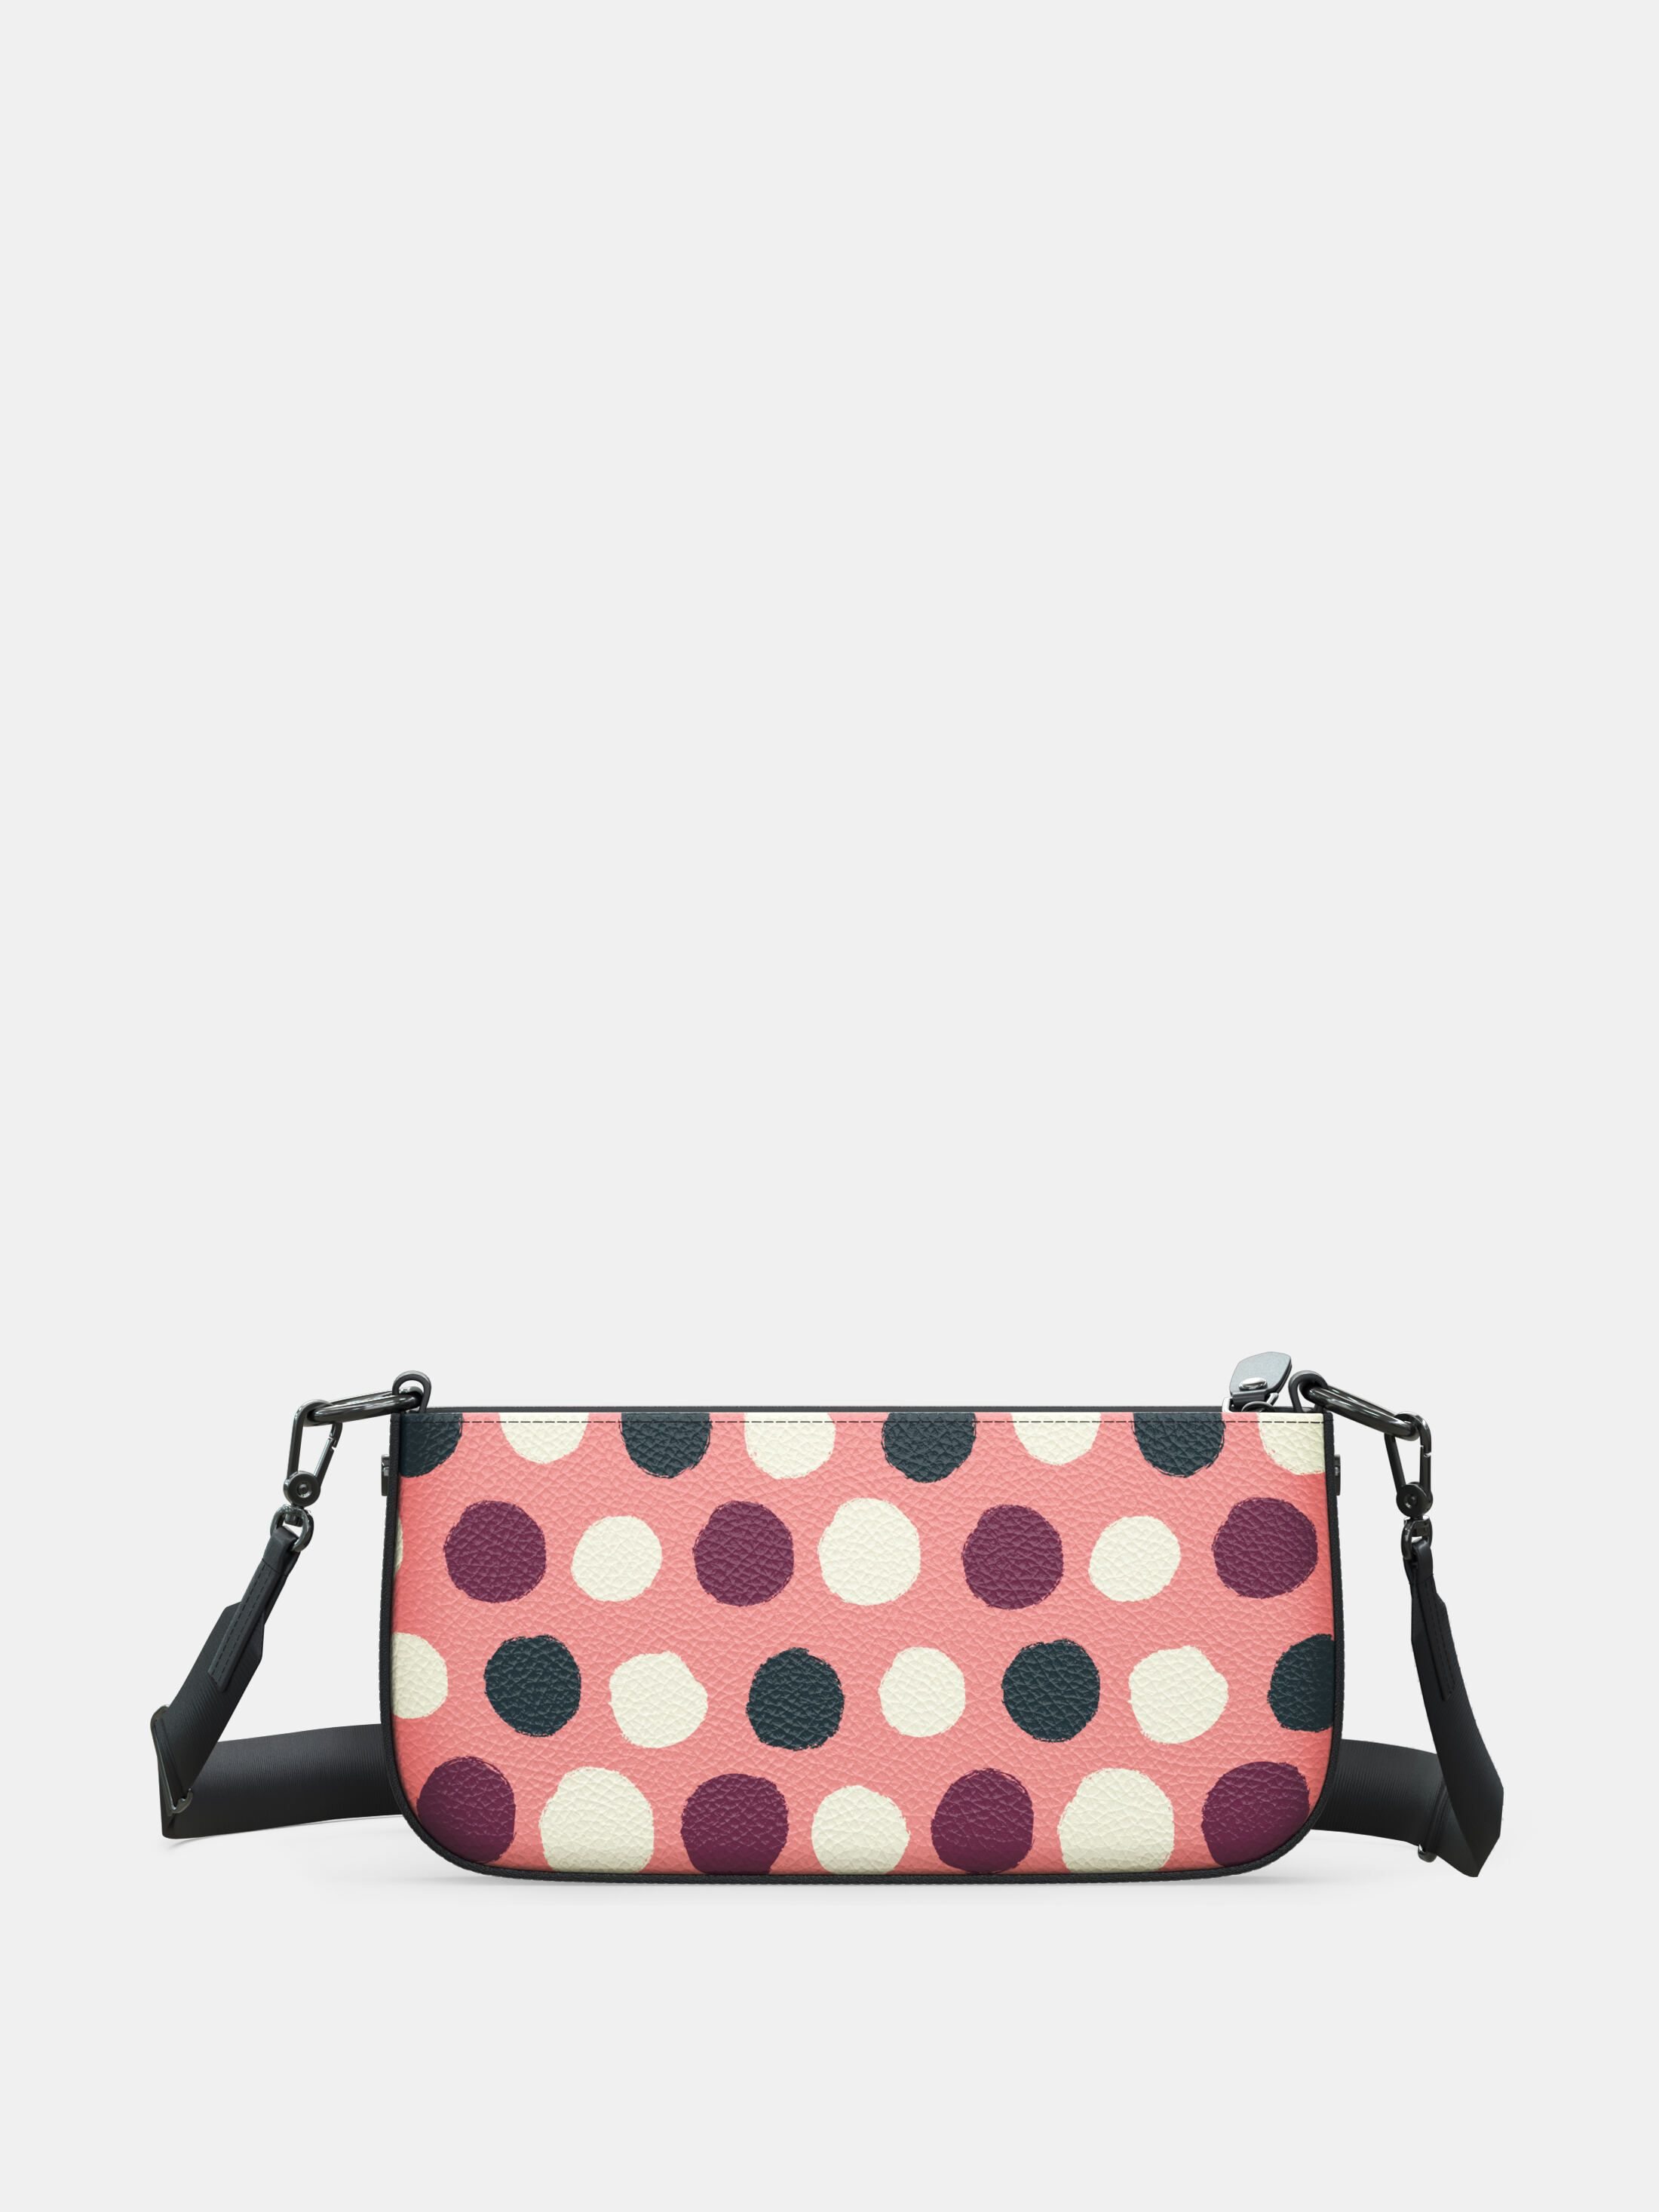 Custom Printed Zipper Pouch Bag